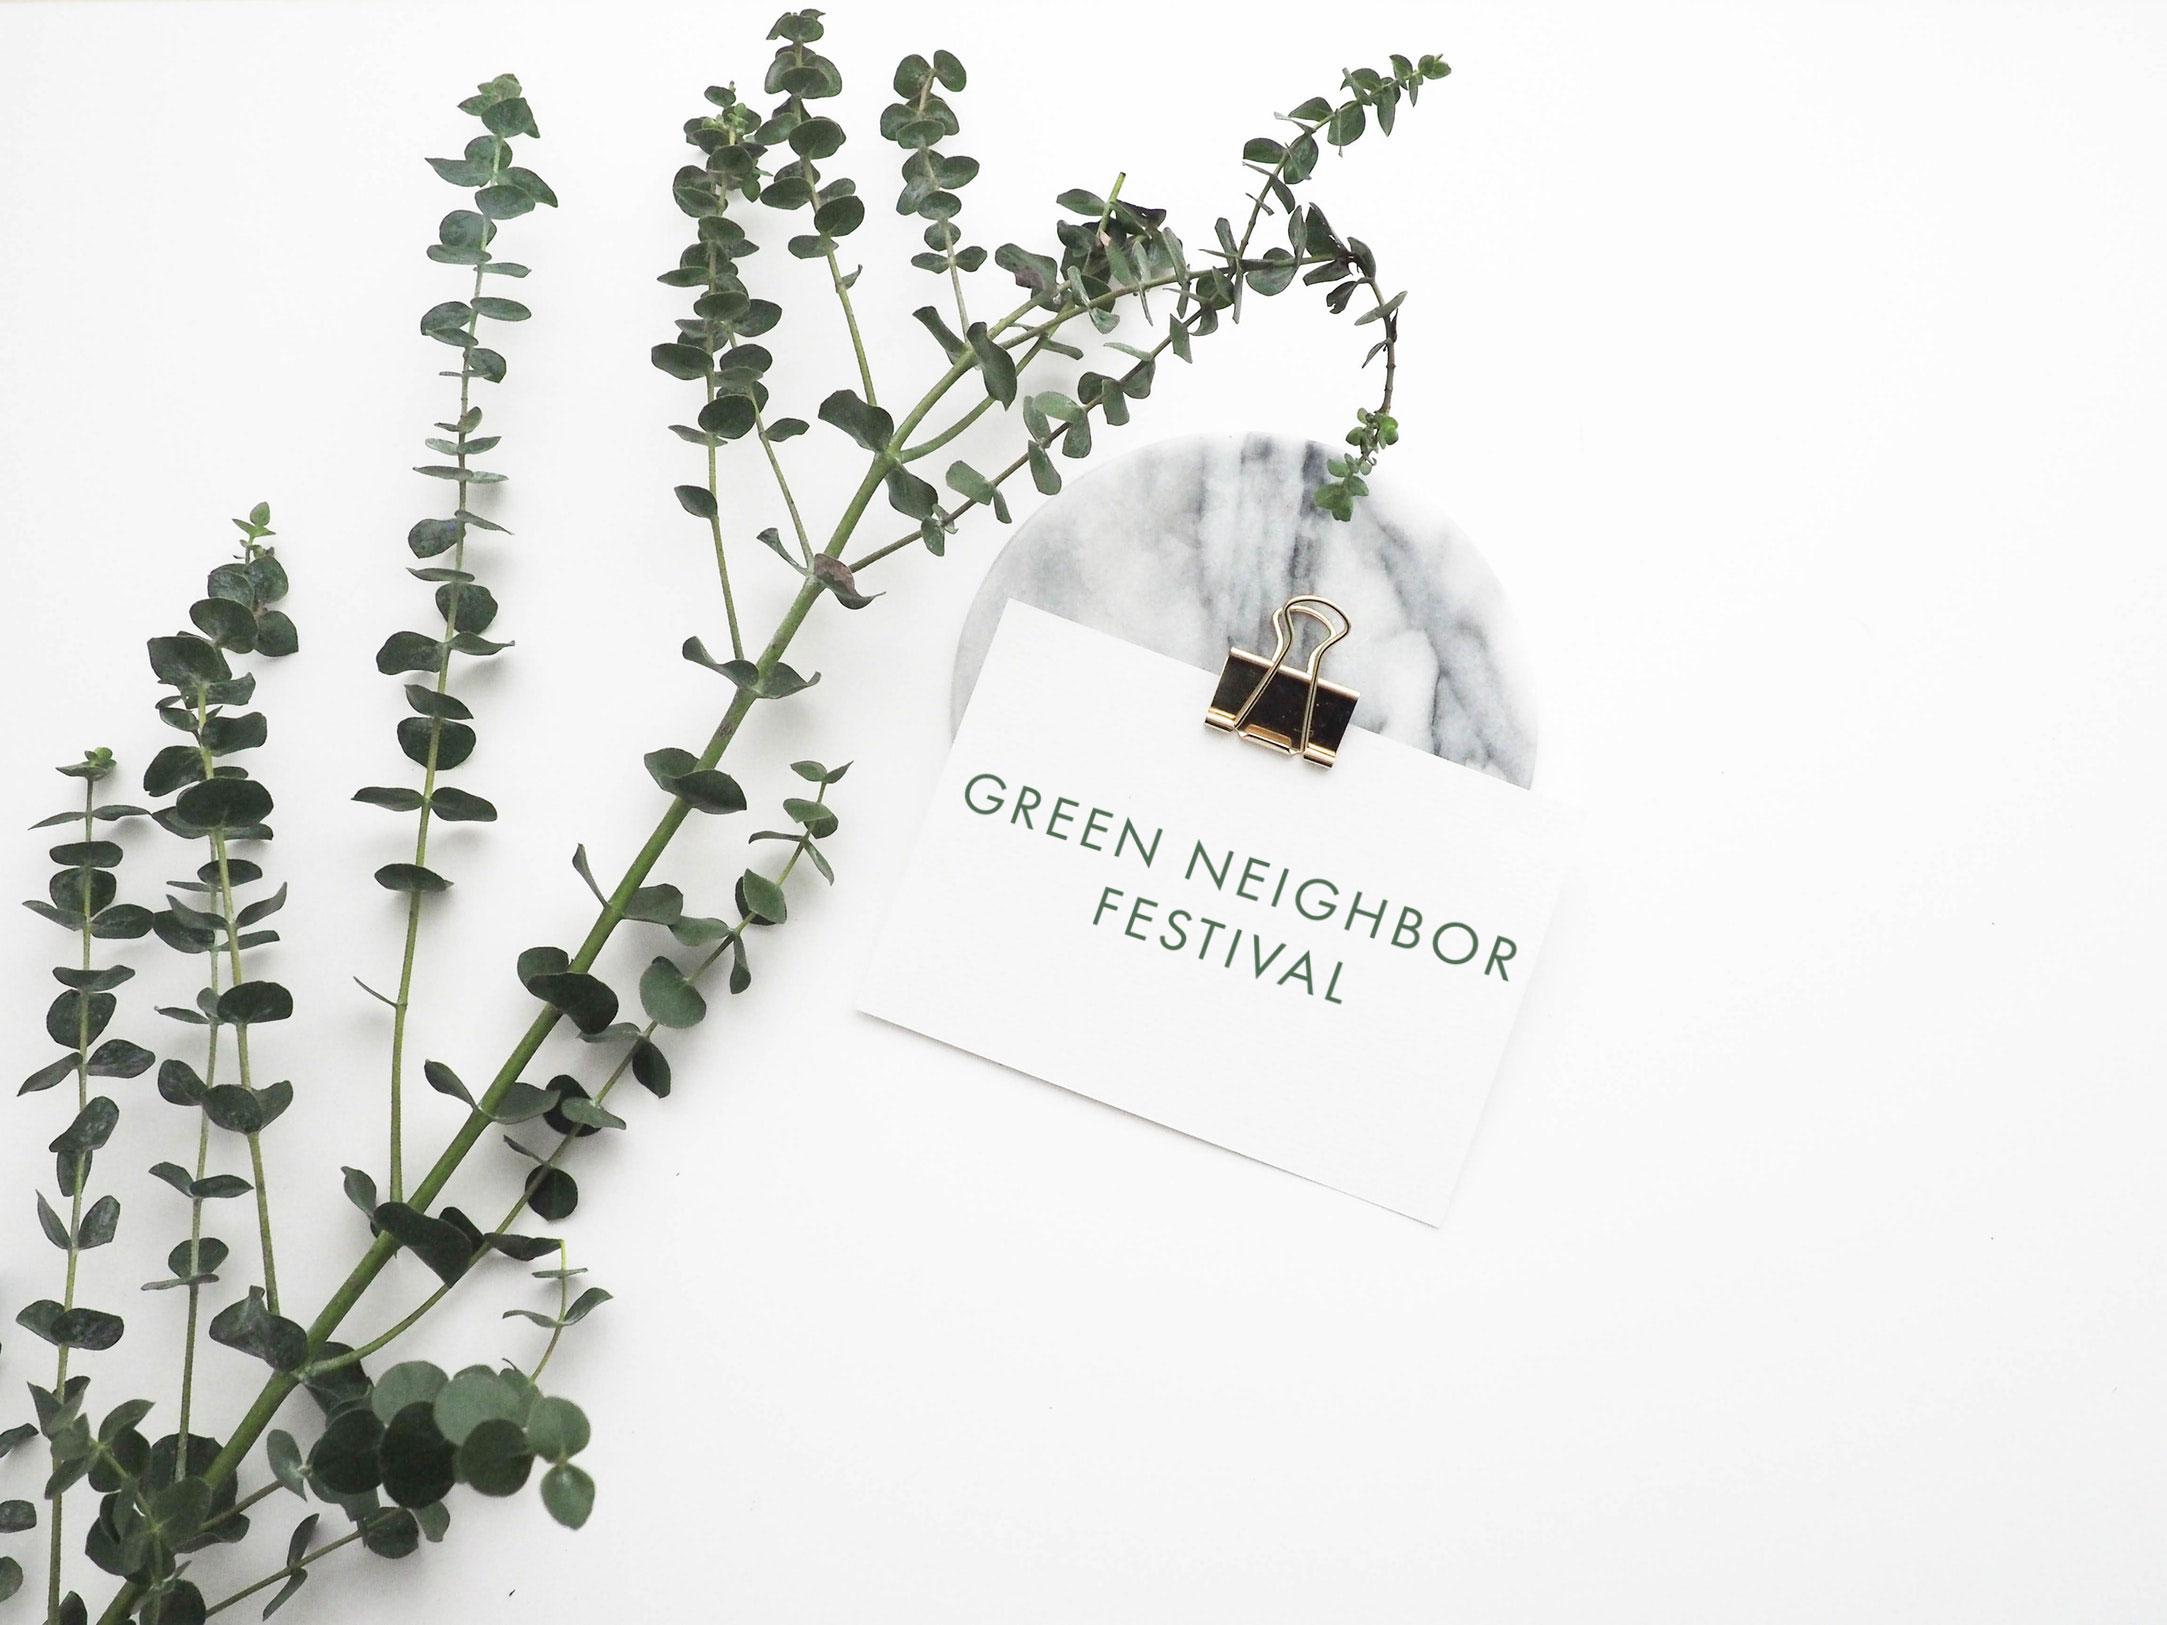 Green-Neighbor.jpg